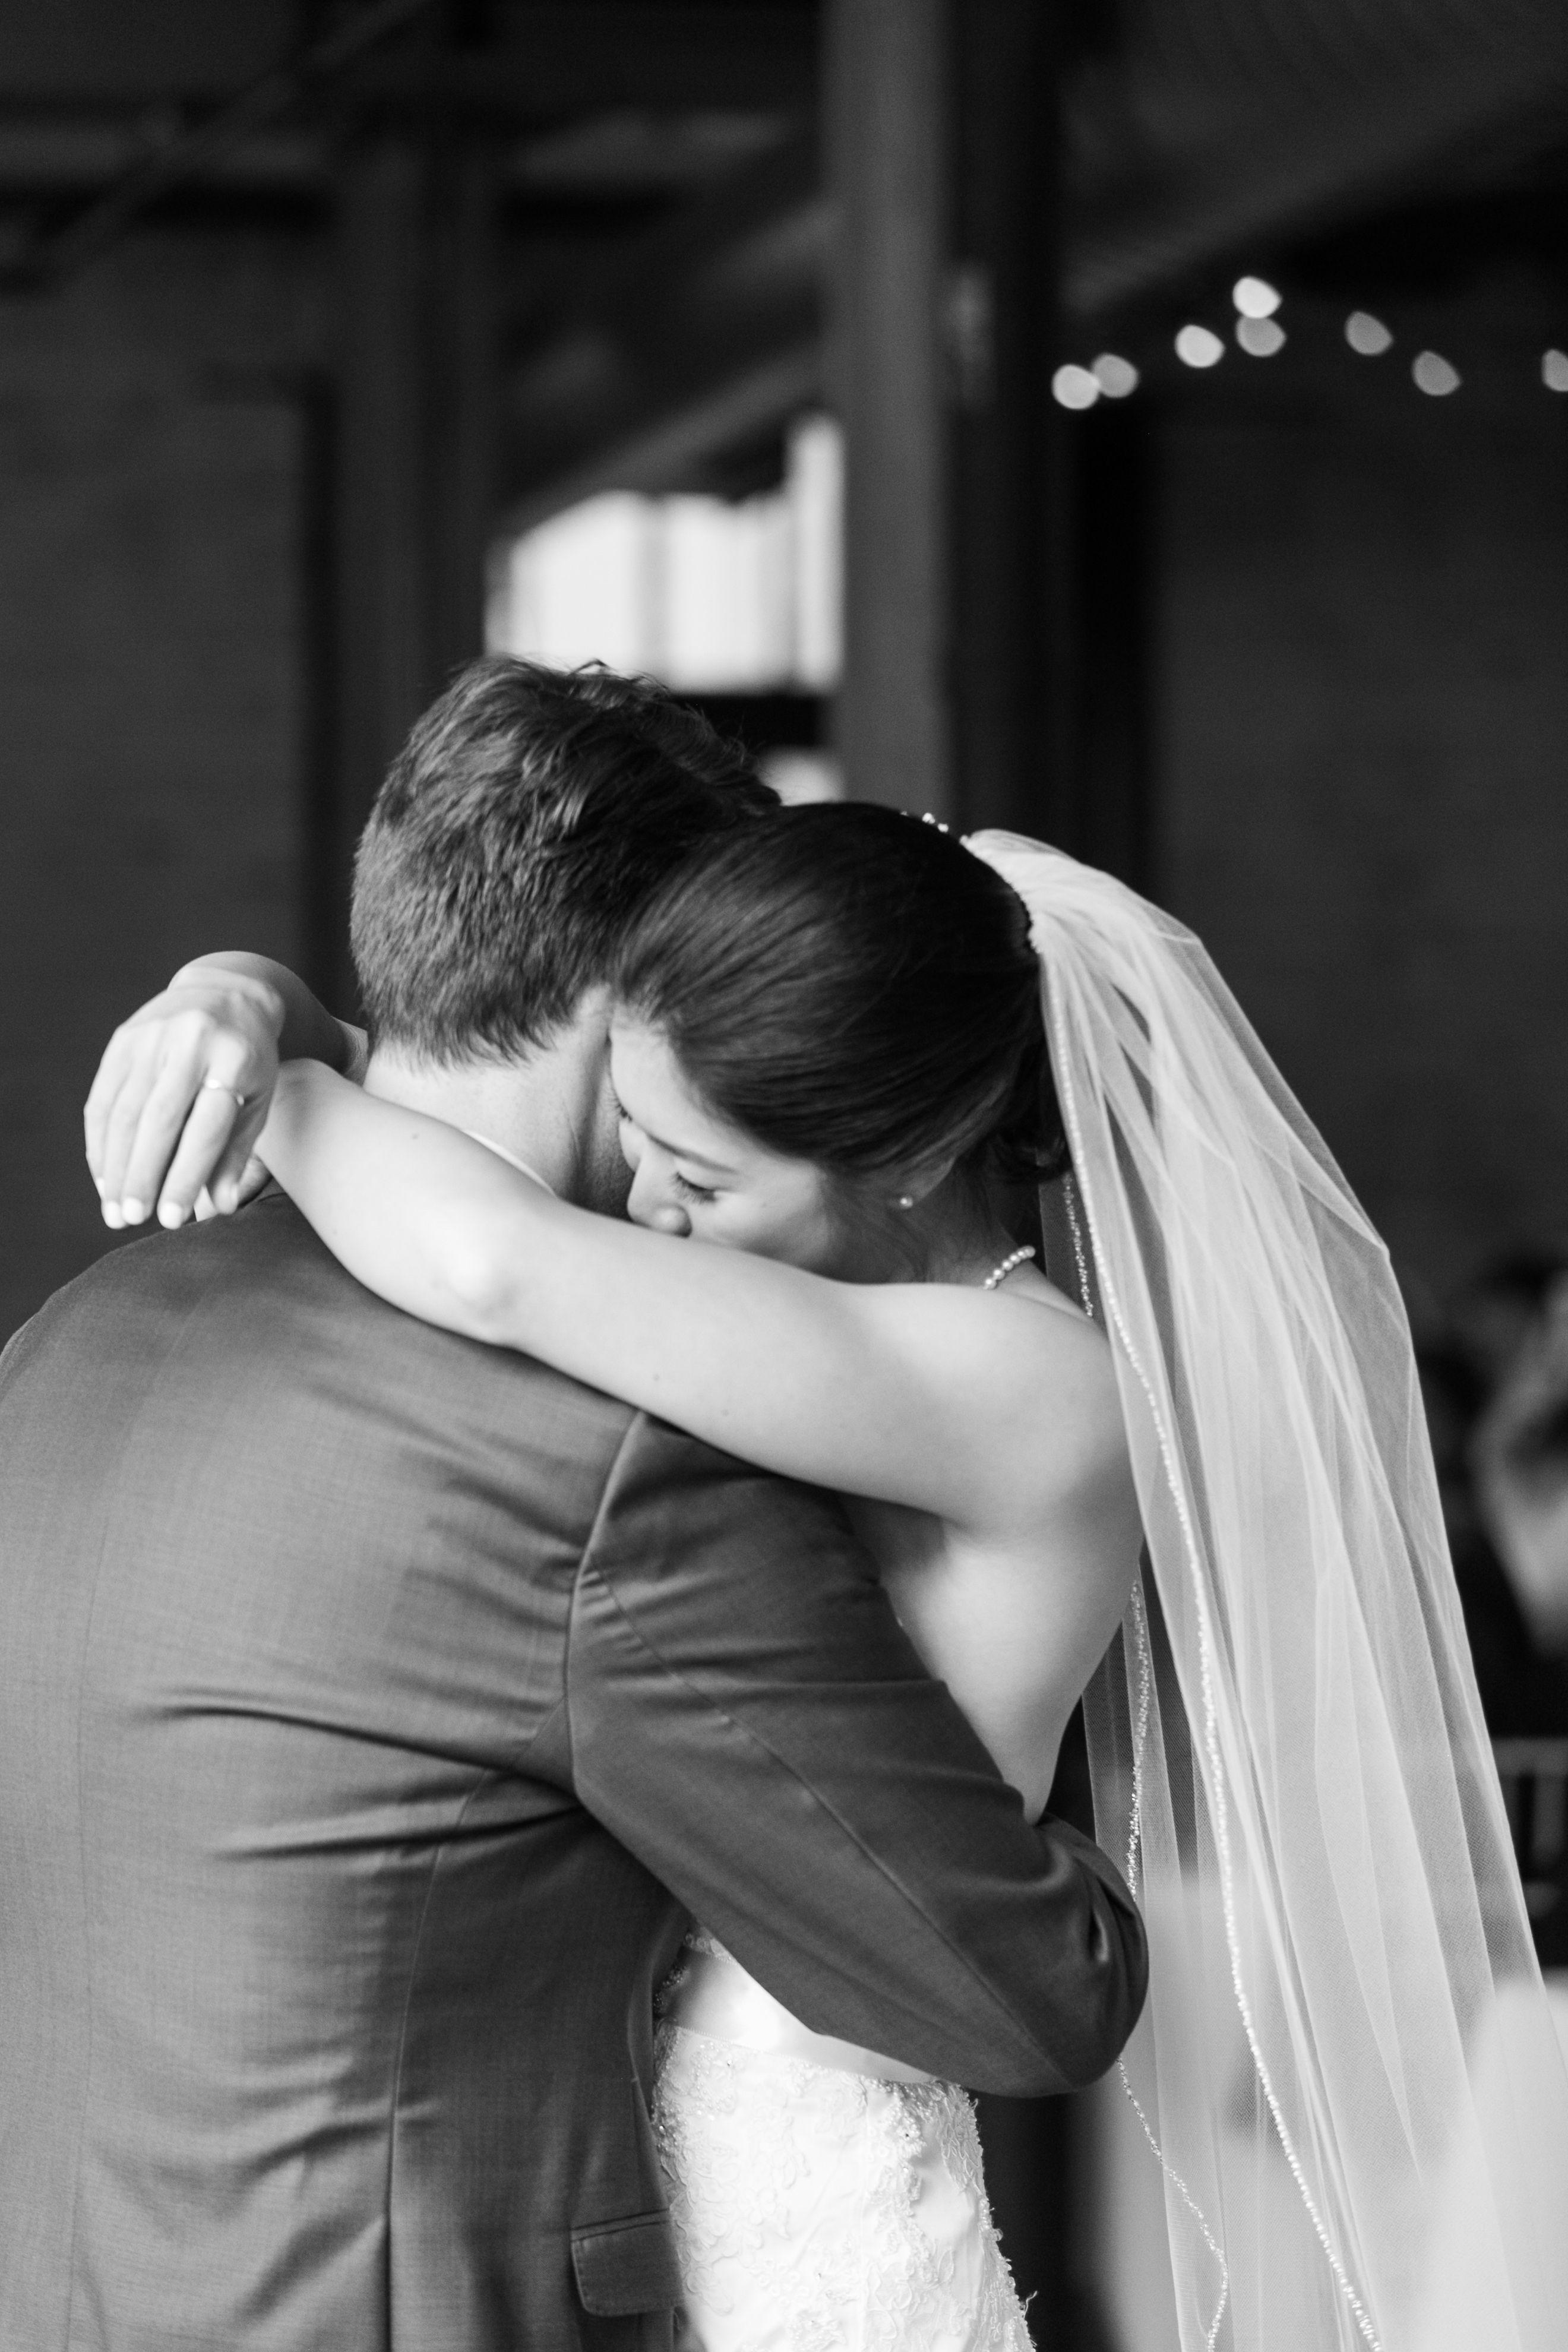 Love Is Composed Of A Single Soul Inhabiting Two Bodies Maximumdj Torontodj Torontowedding Torontoweddingd Wedding Dj Toronto Wedding Popular Wedding